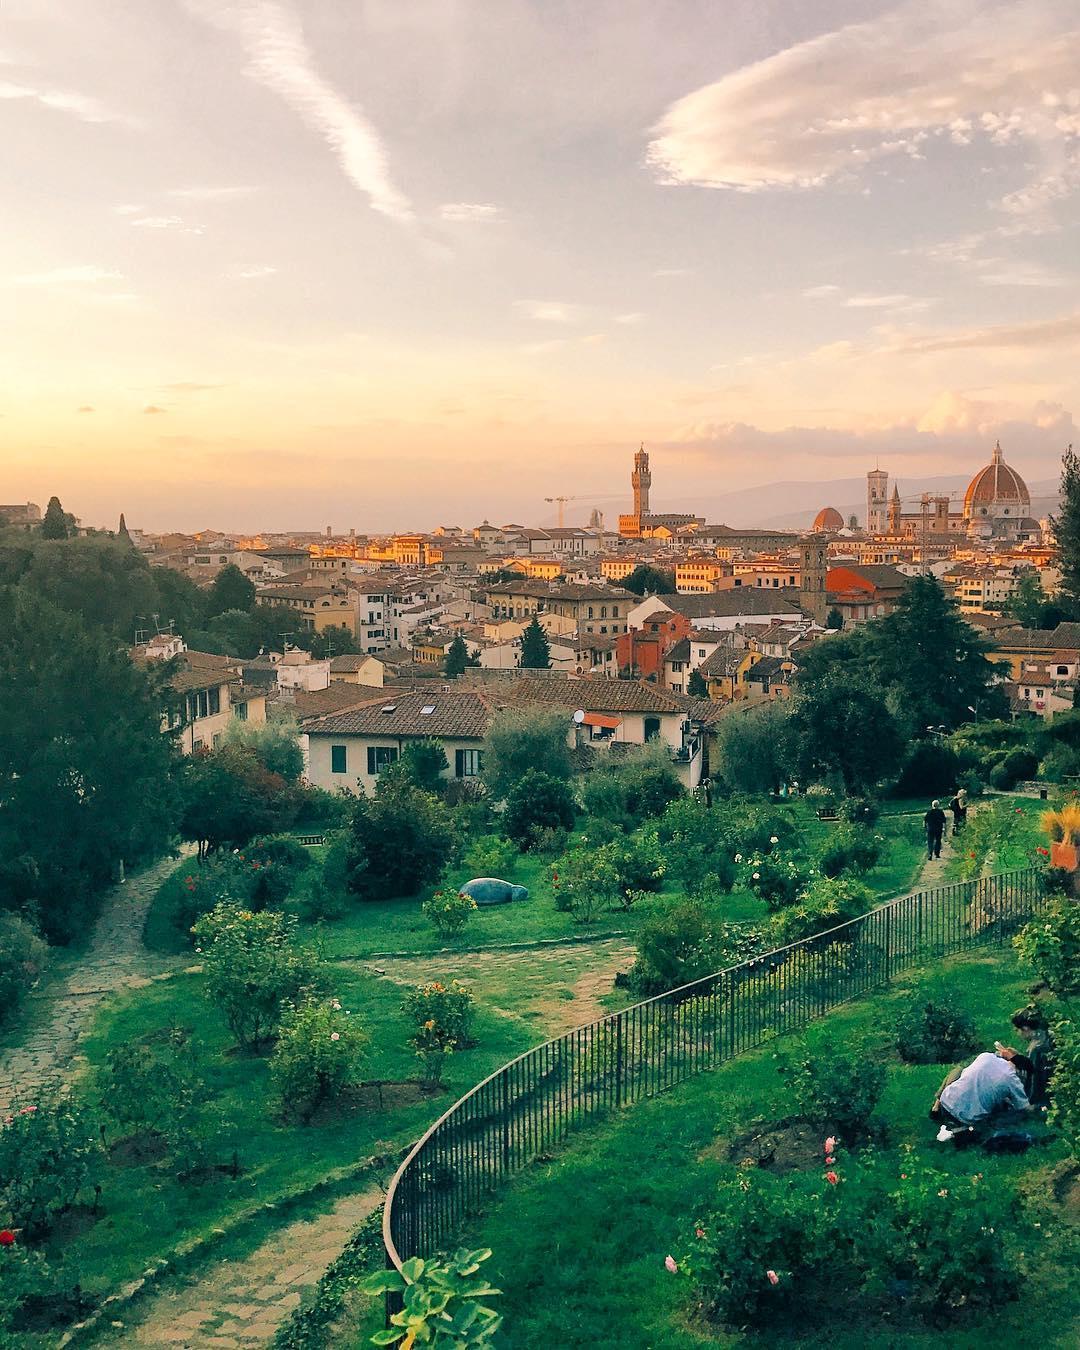 Things to do in Florence @caroline.mejia Giardino delle rose